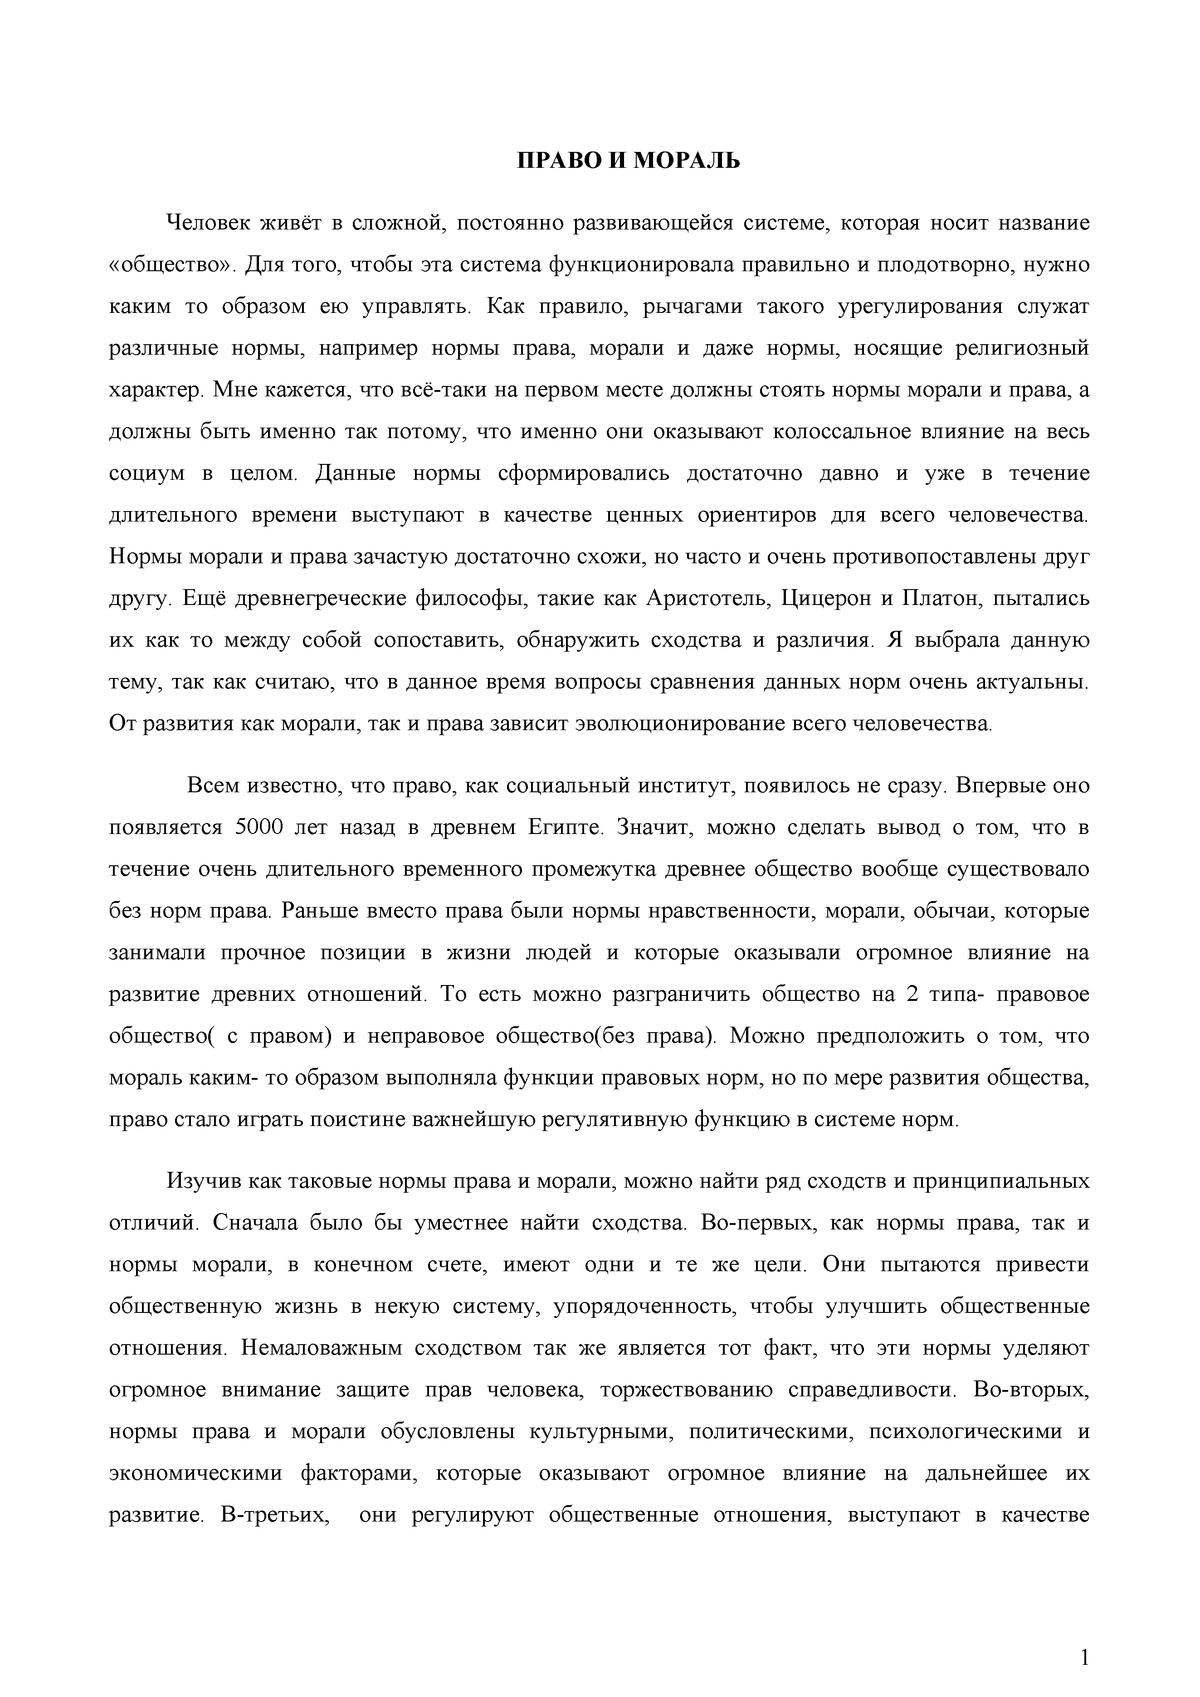 Эссе нарушение прав человека 8023